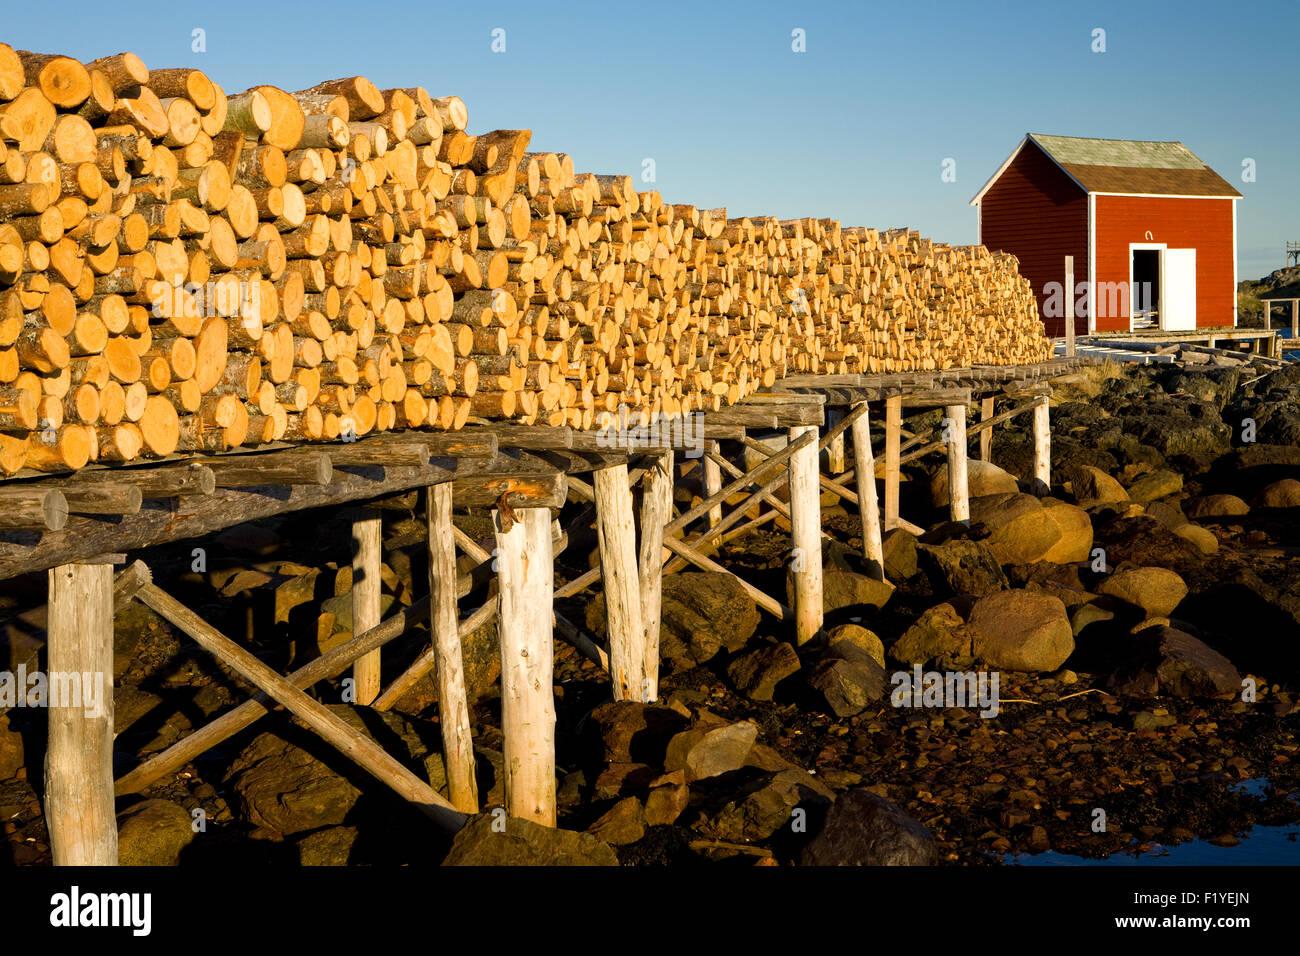 First,Light,Building,Buildings,Bundle,Bundles - Stock Image